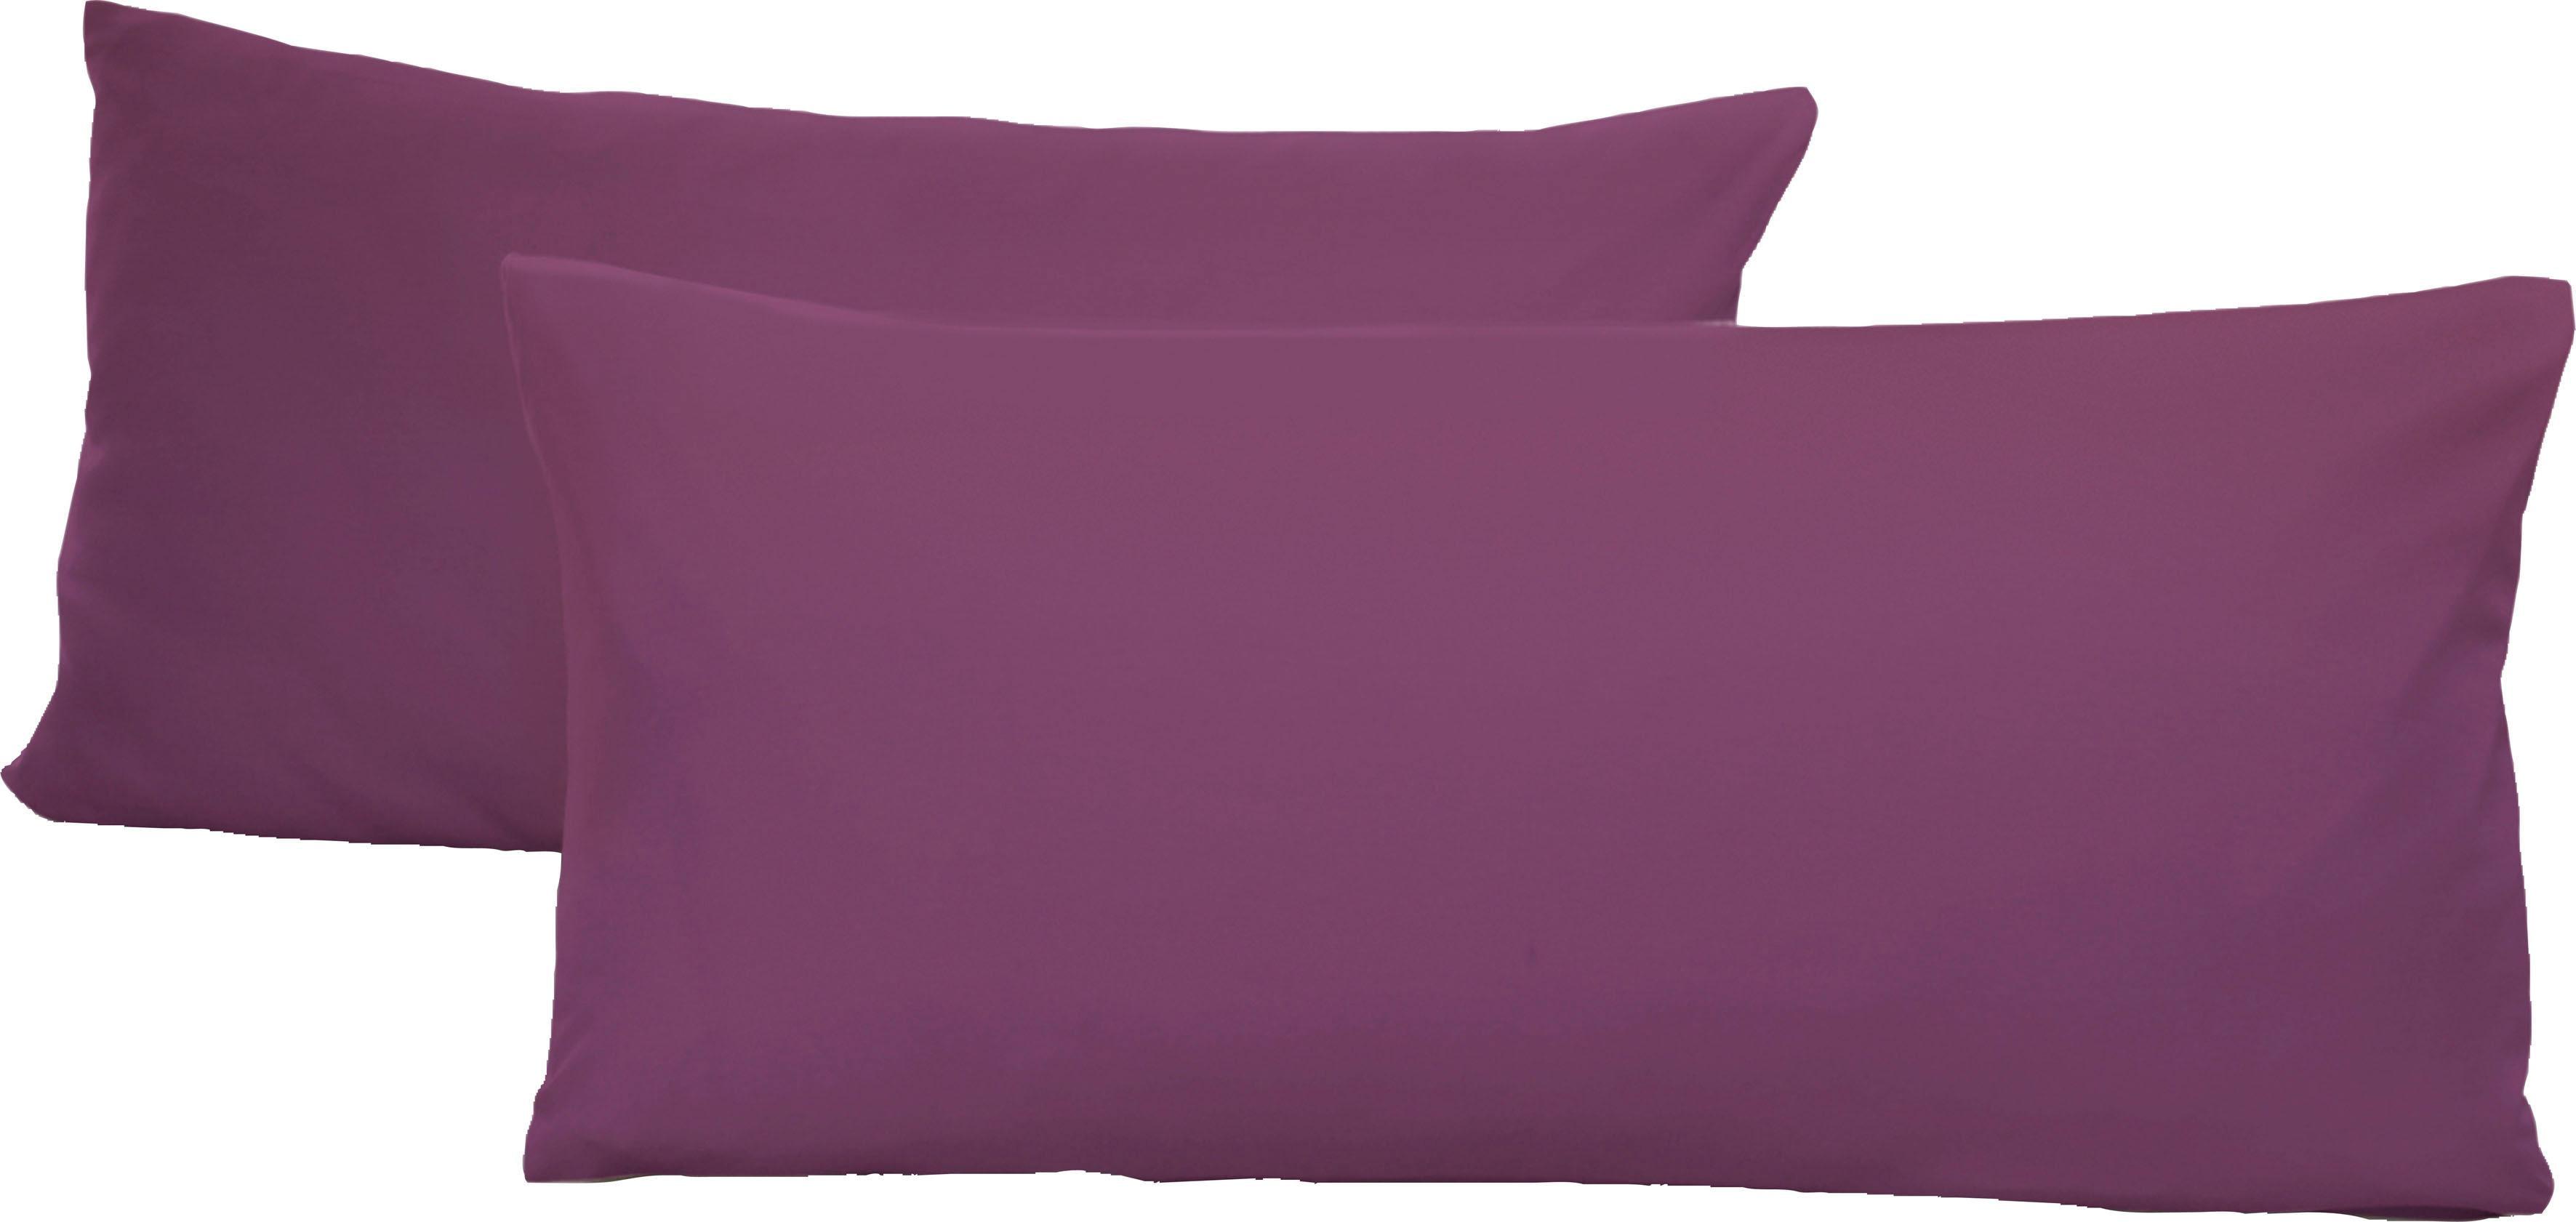 Schlafgut Kissenbezüge Jersey, (2 St.), mit Aloe Vera Ausrüstung lila gemustert Kissen